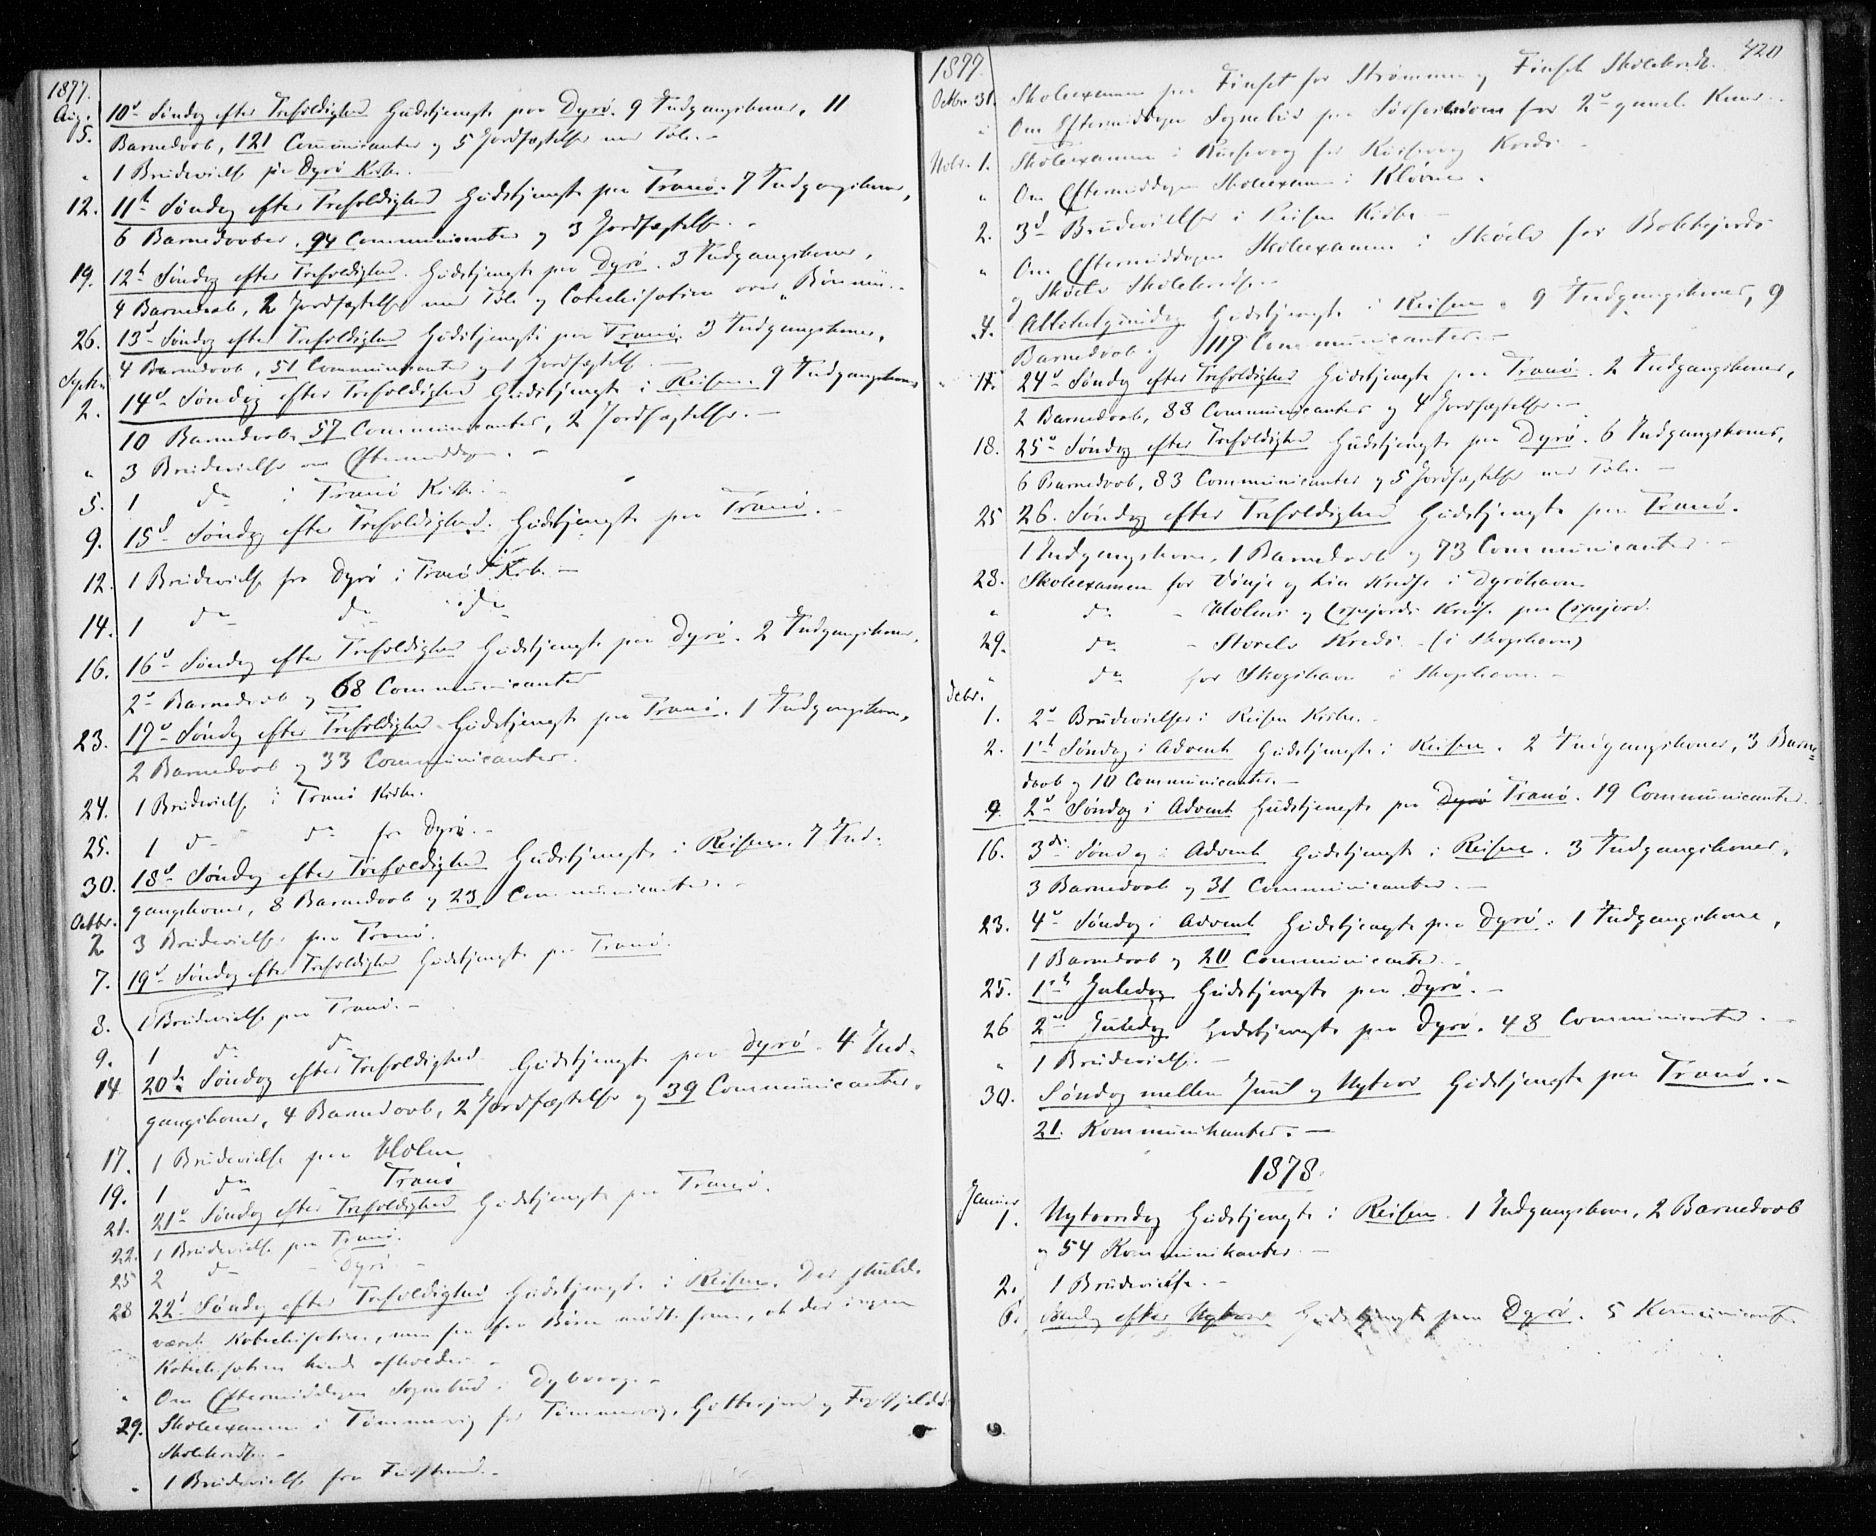 SATØ, Tranøy sokneprestkontor, I/Ia/Iaa/L0008kirke: Ministerialbok nr. 8, 1867-1877, s. 420